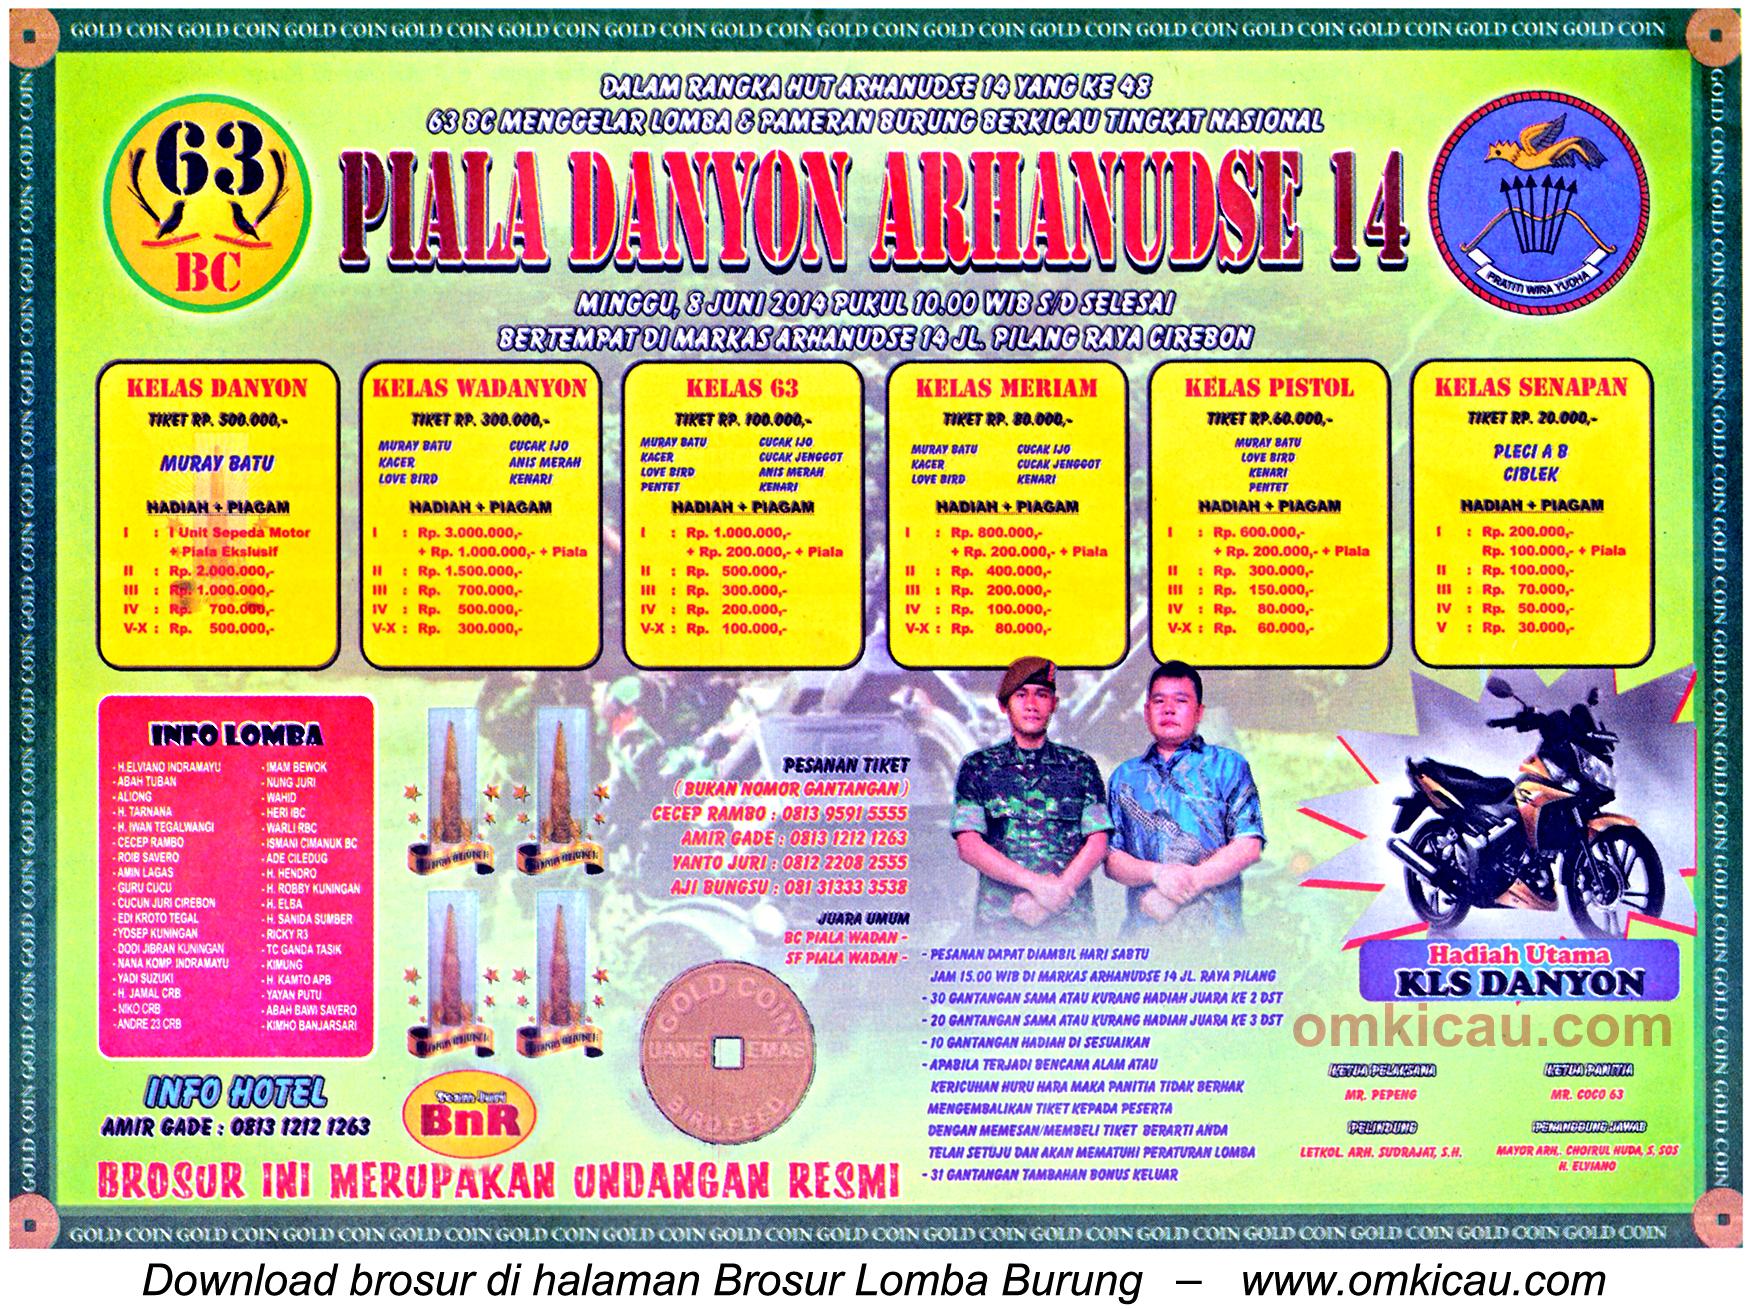 Brosur Lomba Burung Berkicau Piala Danyon Arhanudse 14, Cirebon, 8 Juni 2014